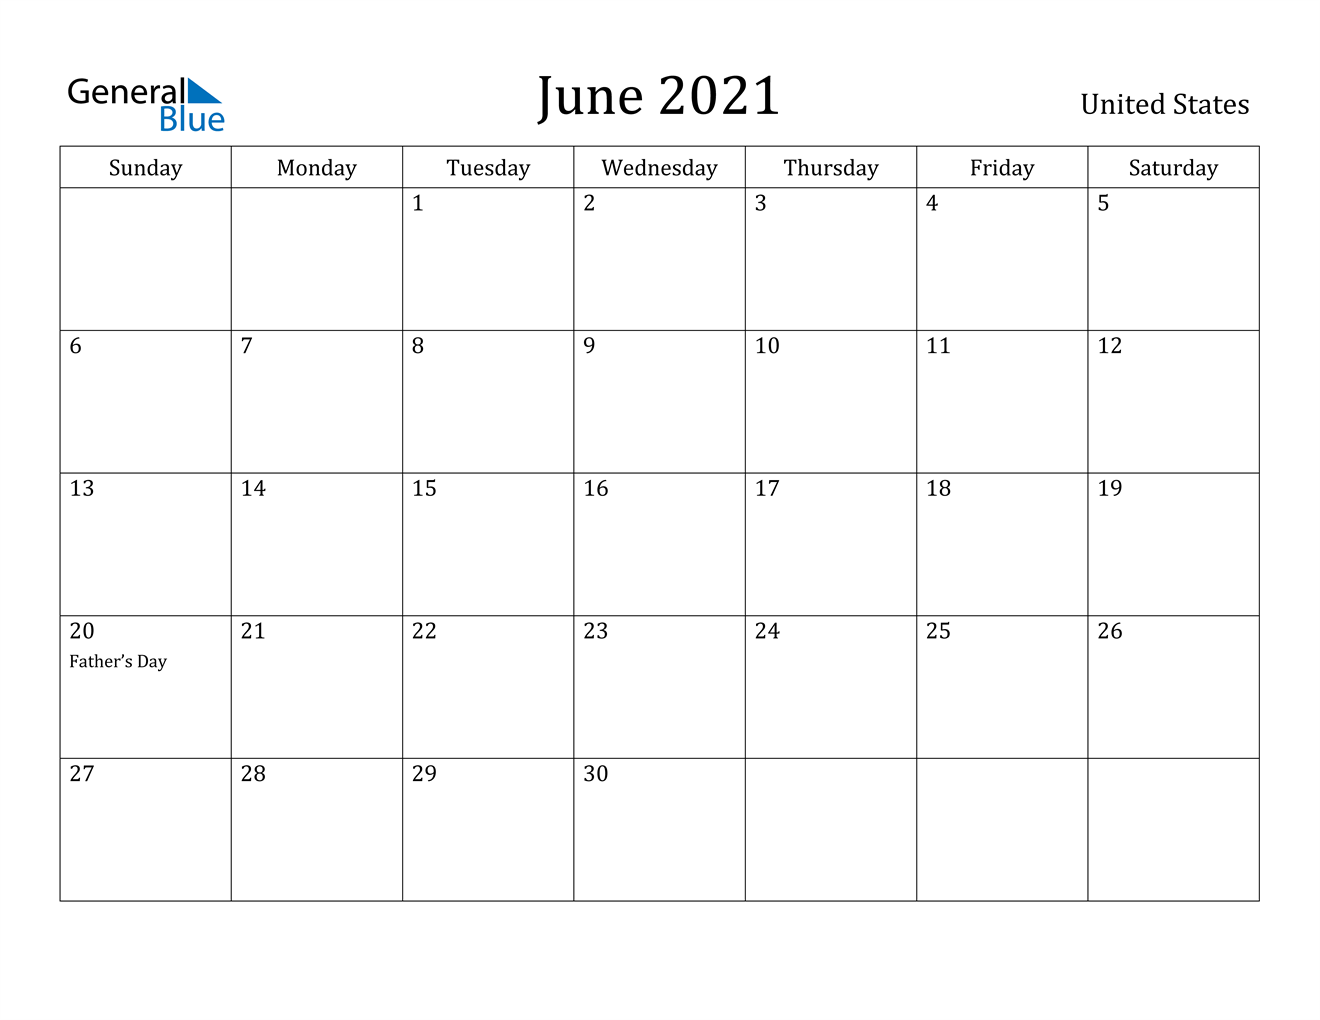 June 2021 Calendar - United States